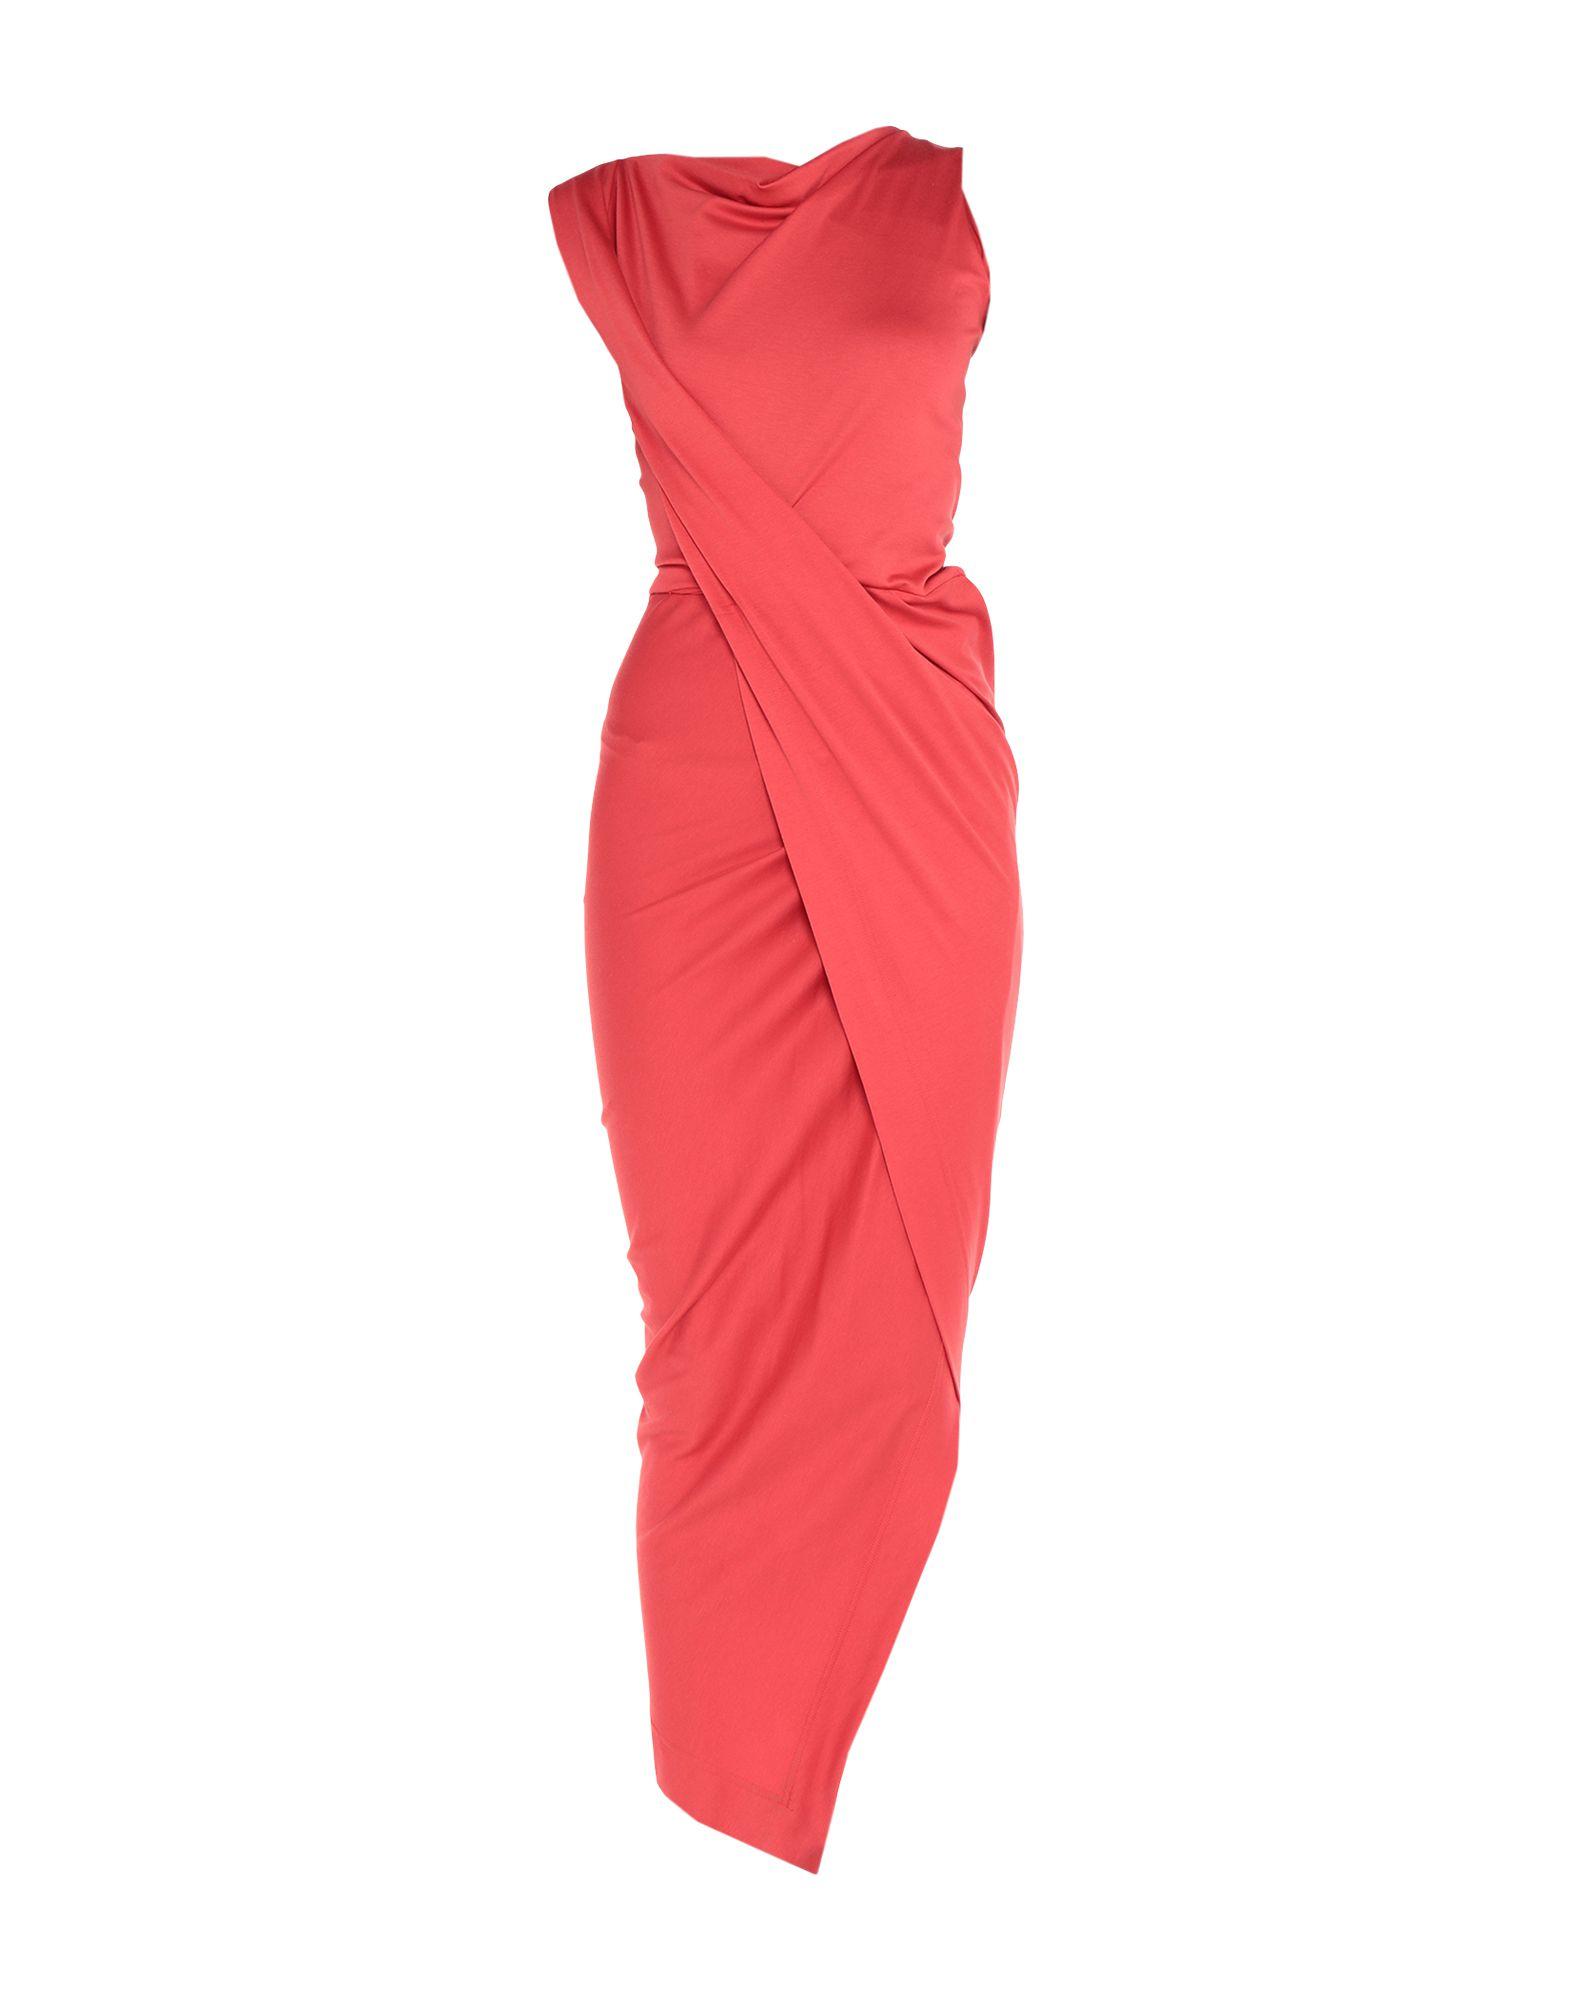 VIVIENNE WESTWOOD ANGLOMANIA Платье длиной 3/4 платье vivienne westwood anglomania vivienne westwood anglomania vi989ewzzq50